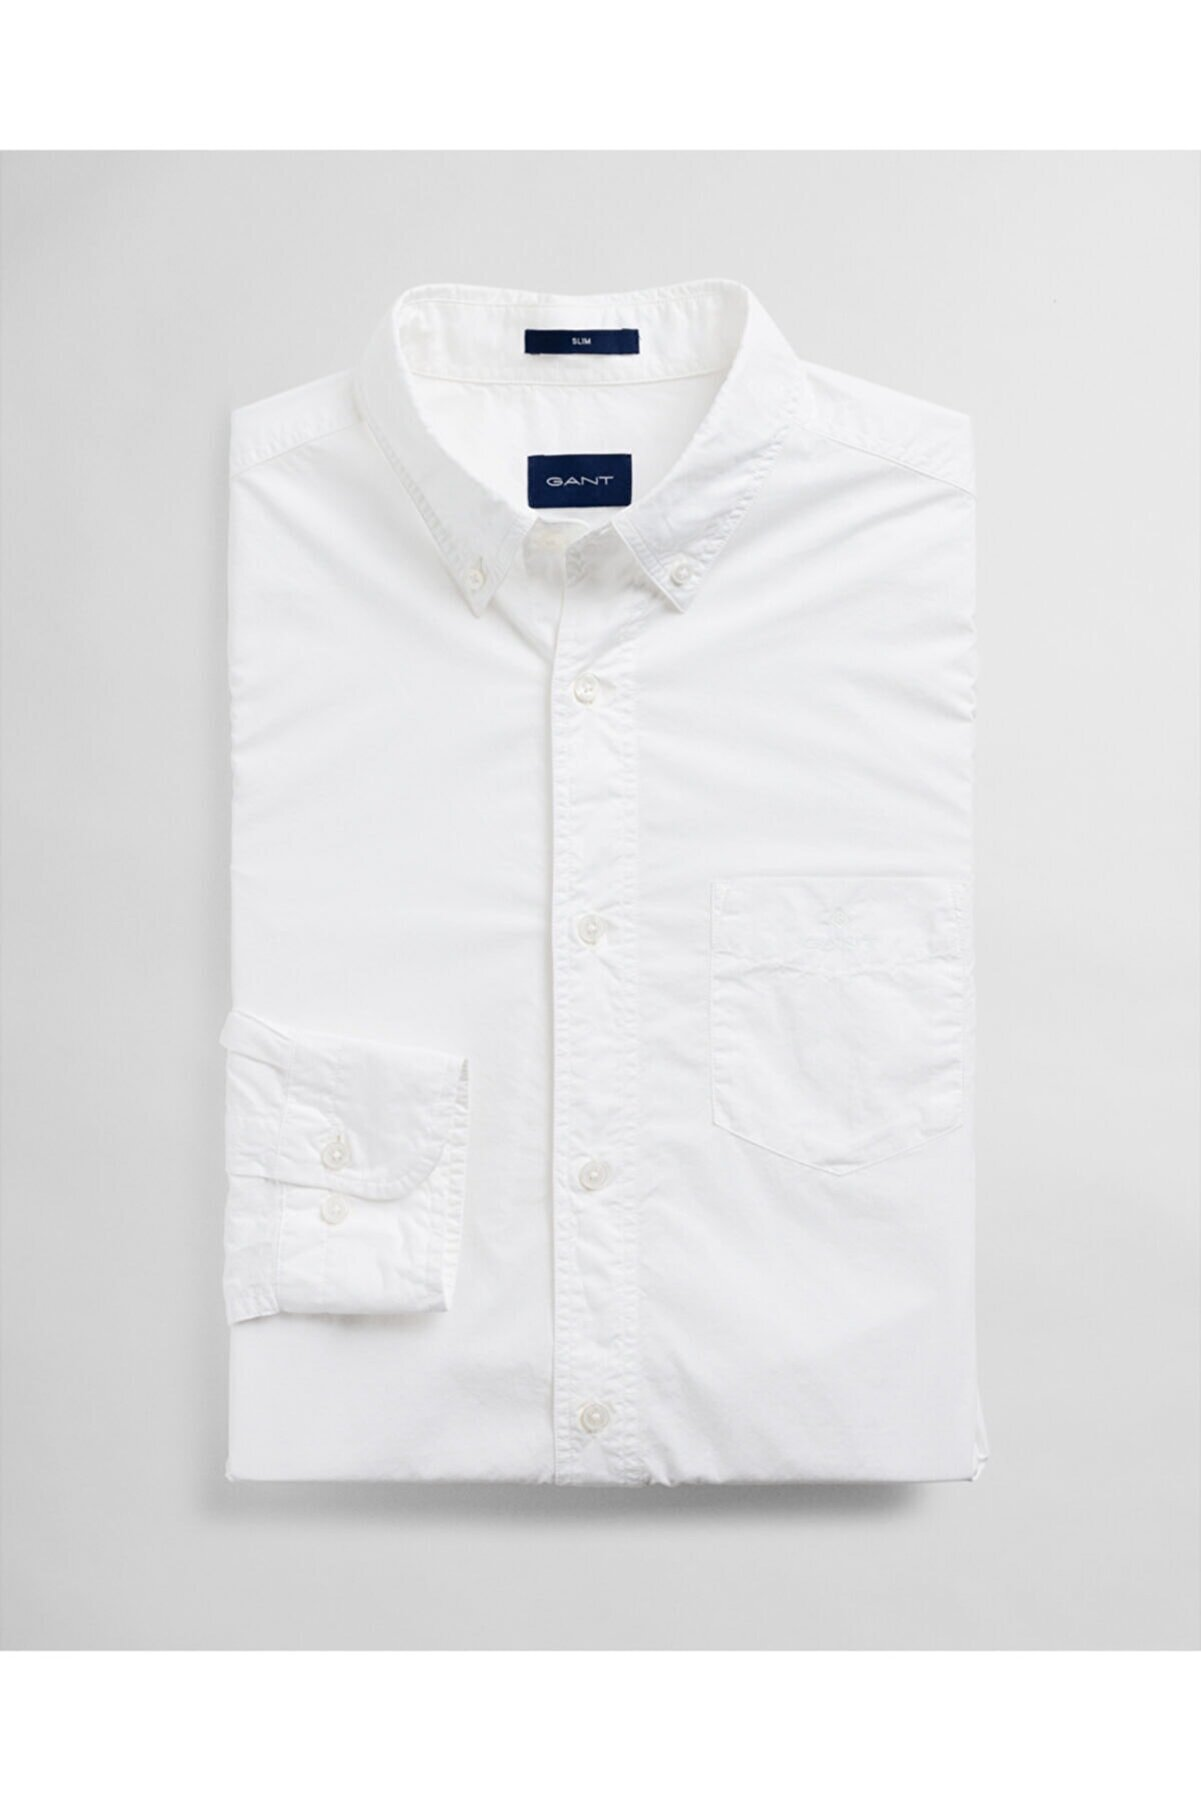 Gant Erkek Slim Fit Beyaz Slim Fit Gömlek 3024332